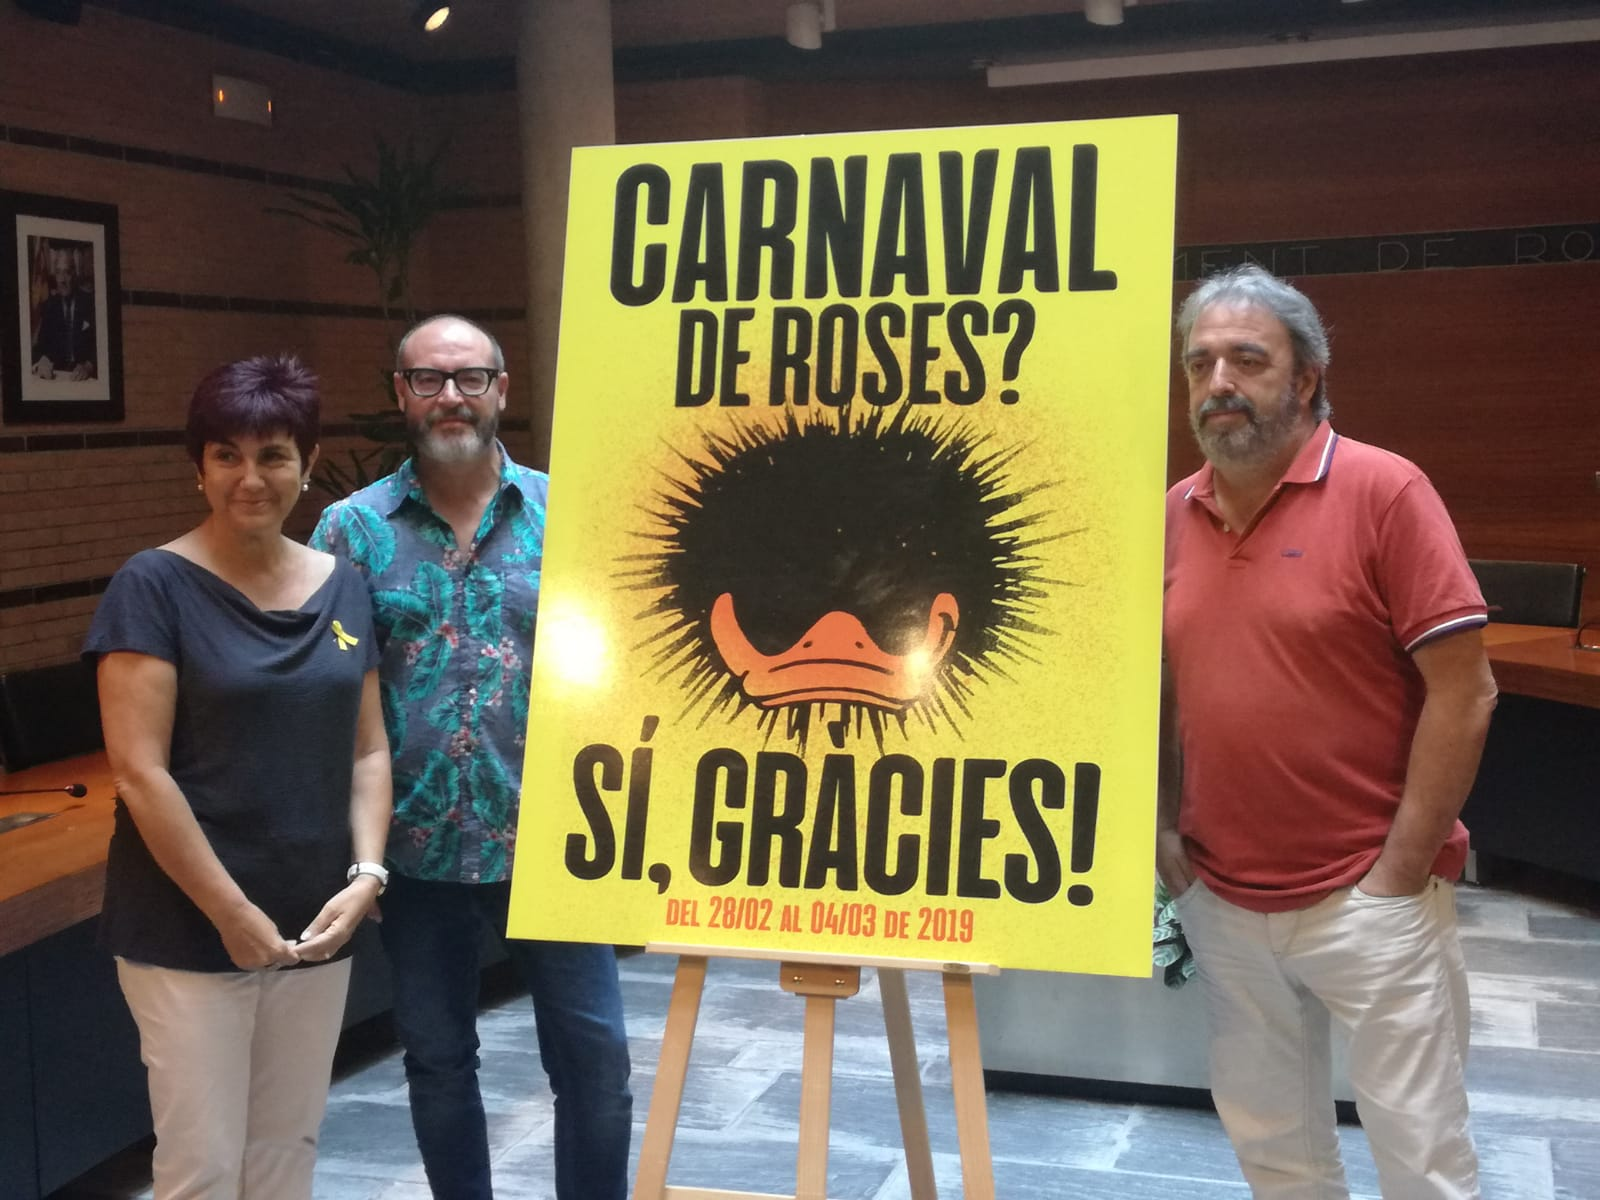 Ja tenim Cartell per al Carnaval de Roses 2019